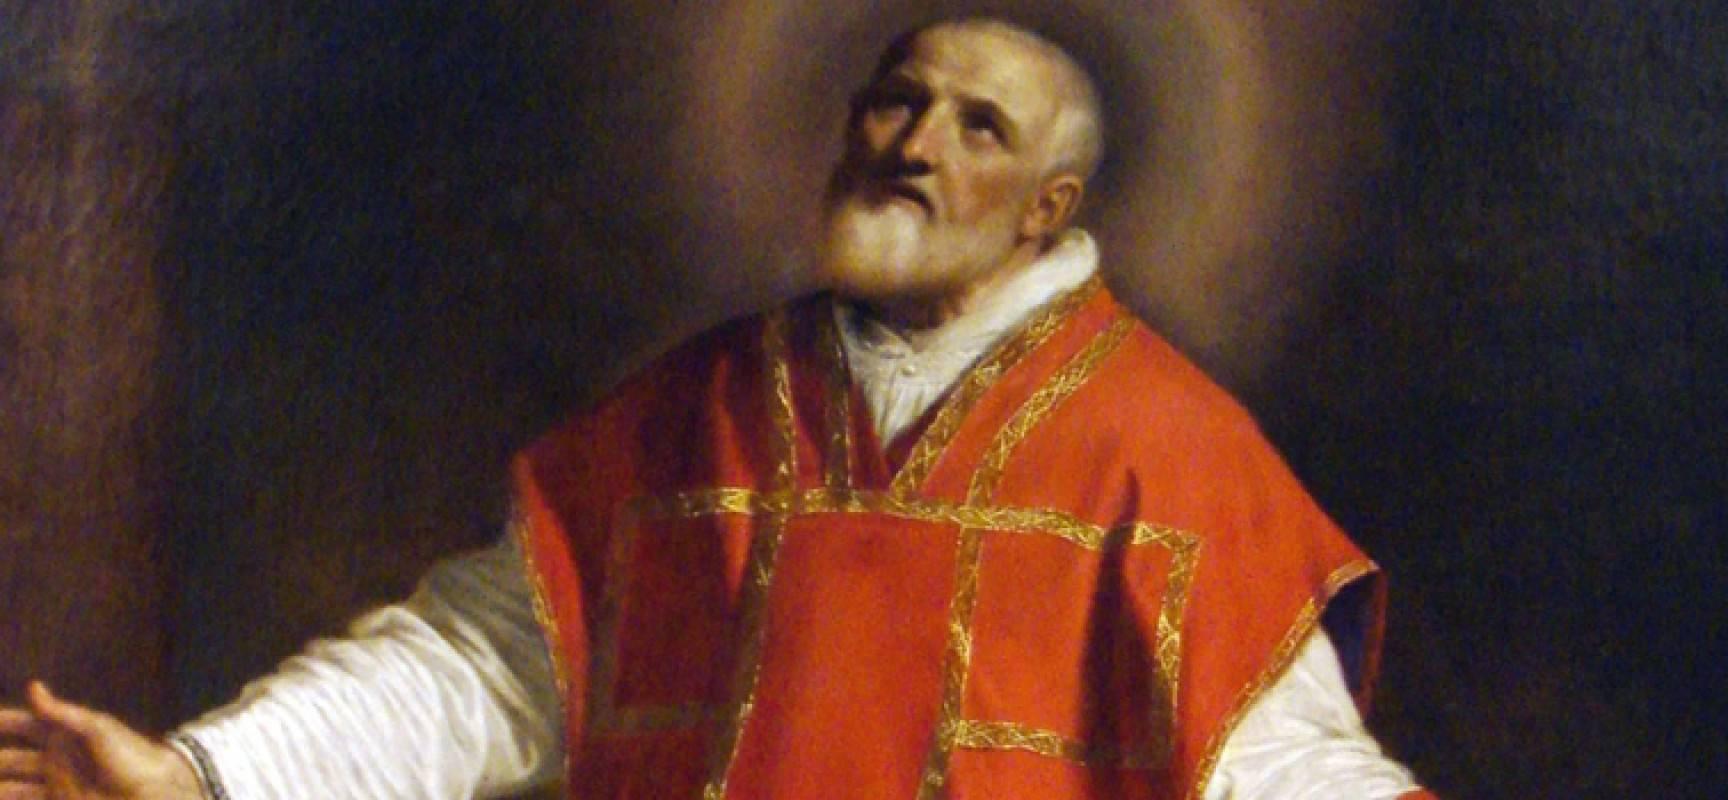 Oggi celebriamo San Filippo Neri